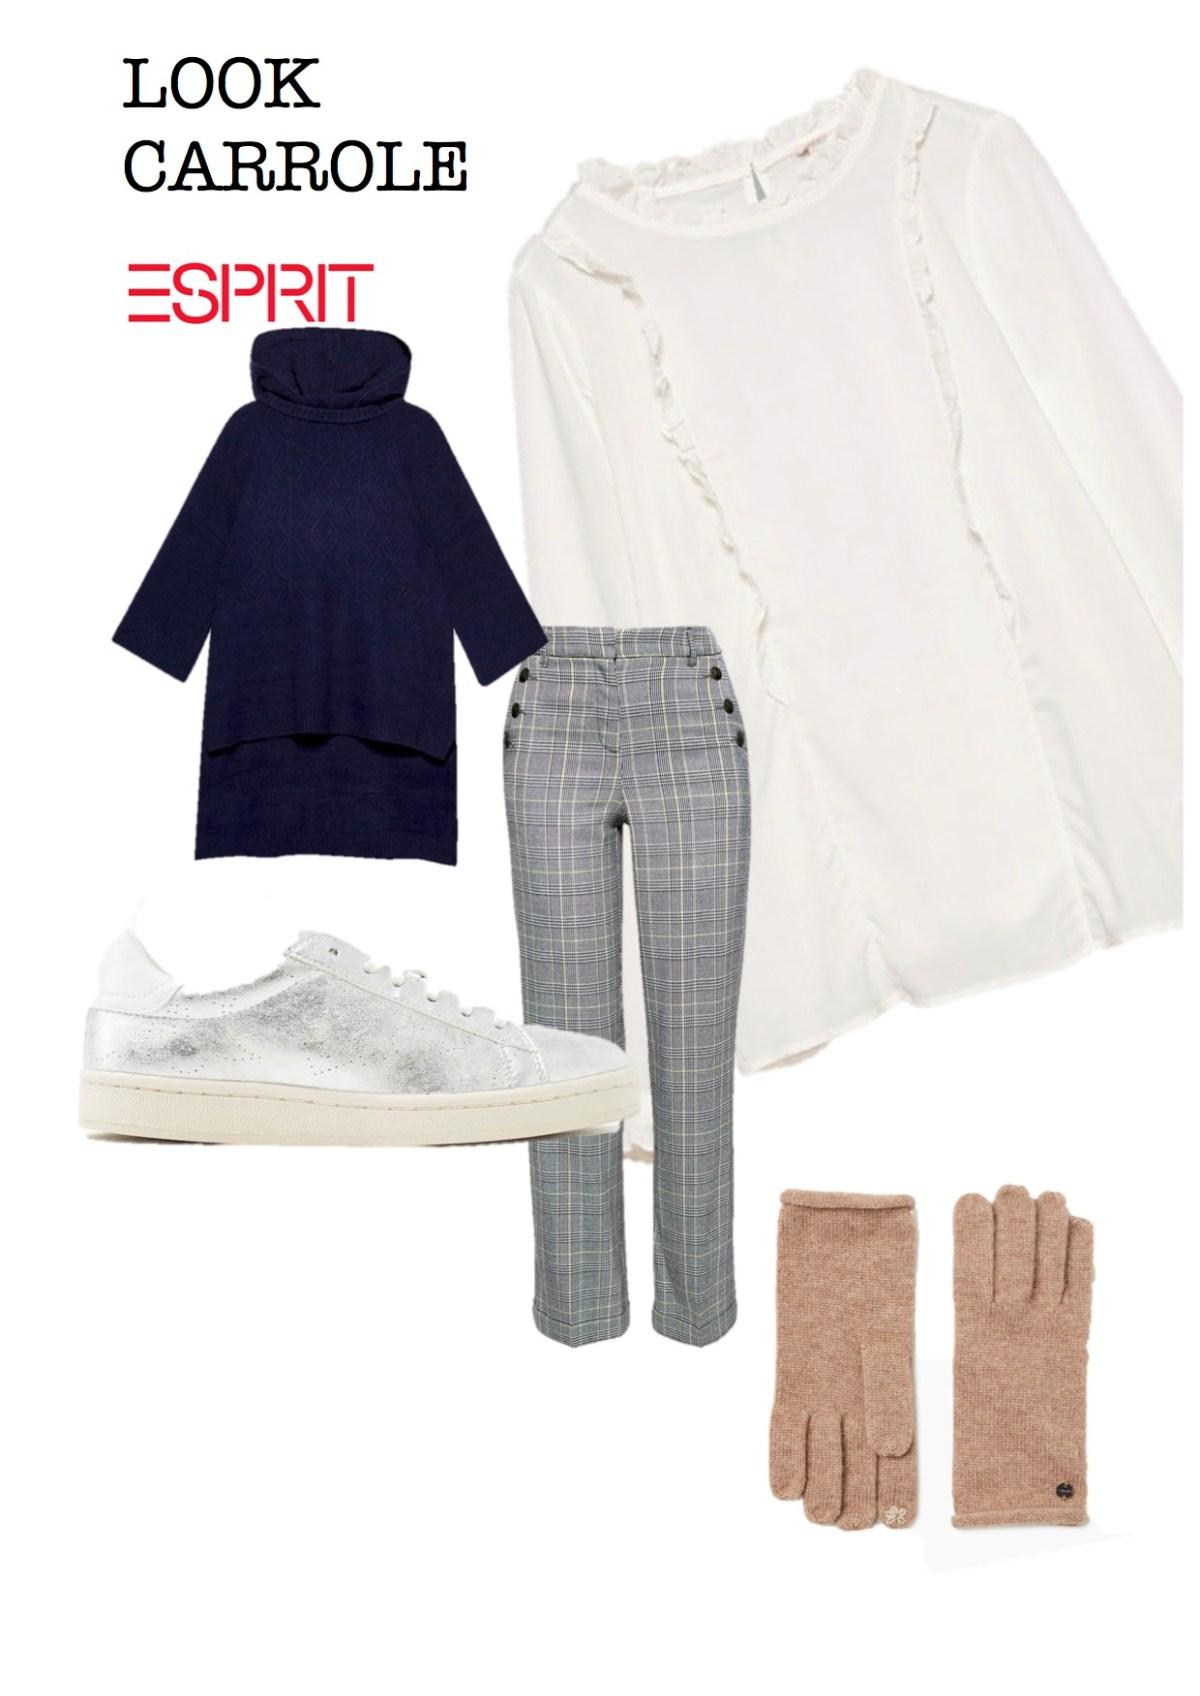 Look Carrolé esprit blog thereseandthekids mode tenue